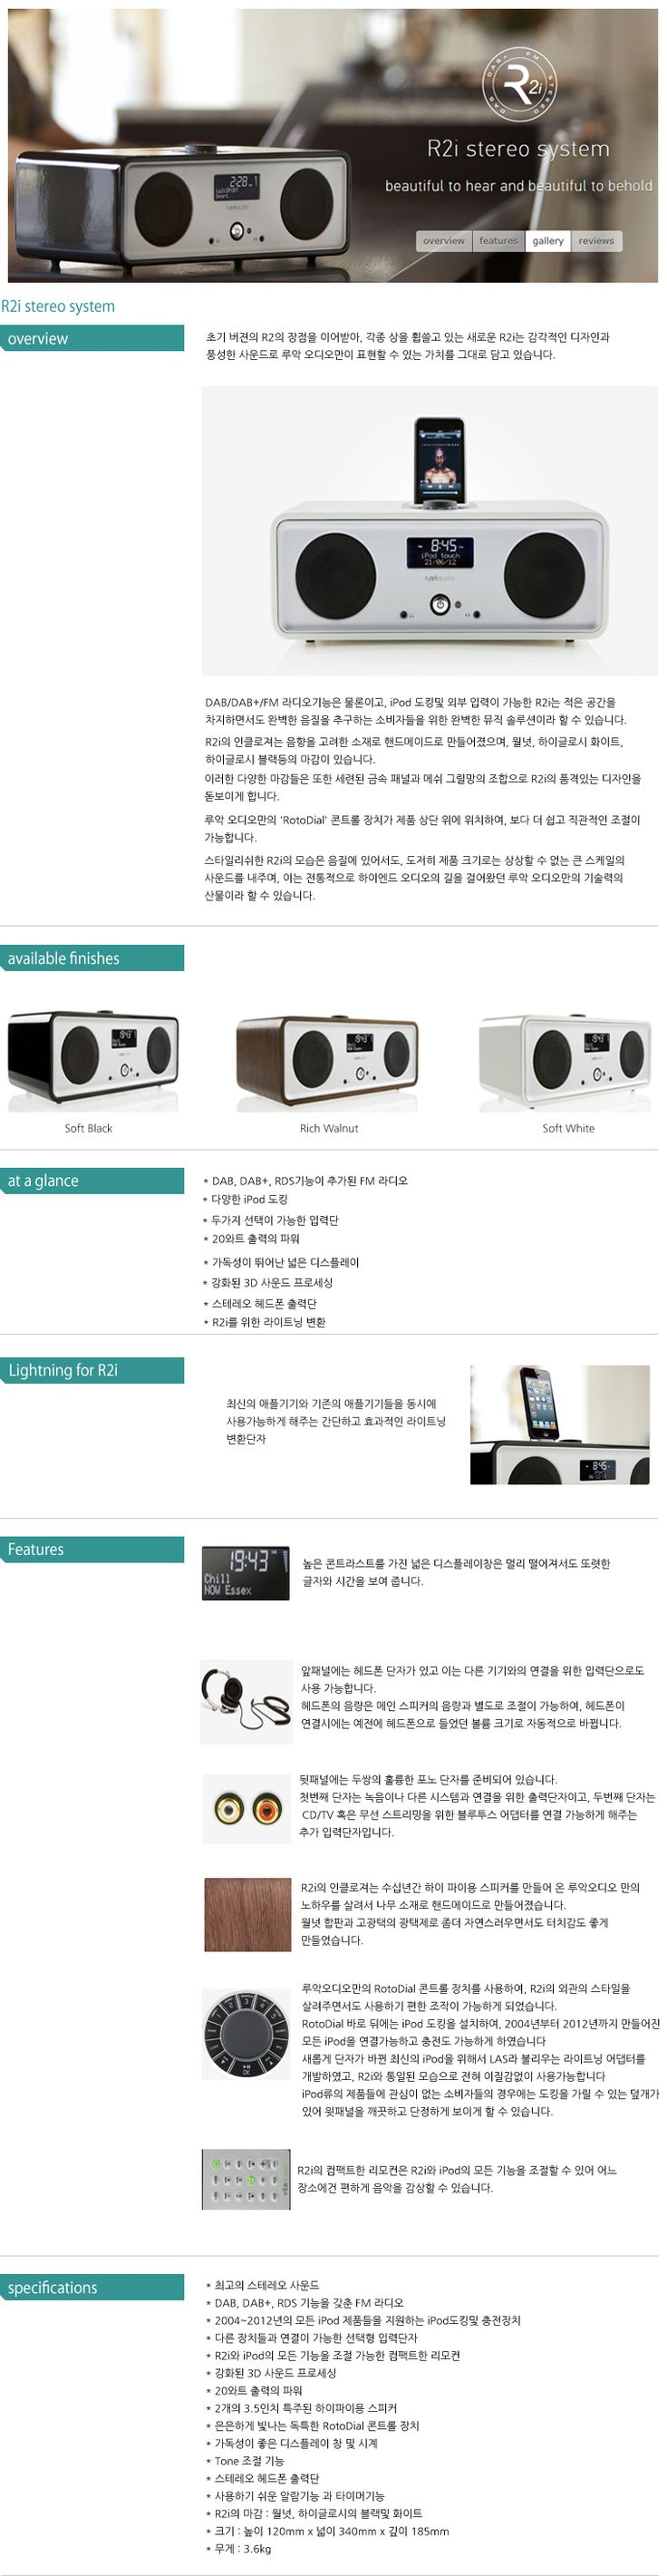 R2i : stereo system FM(DAB) + ipod + Alarm www.delfin.co.kr